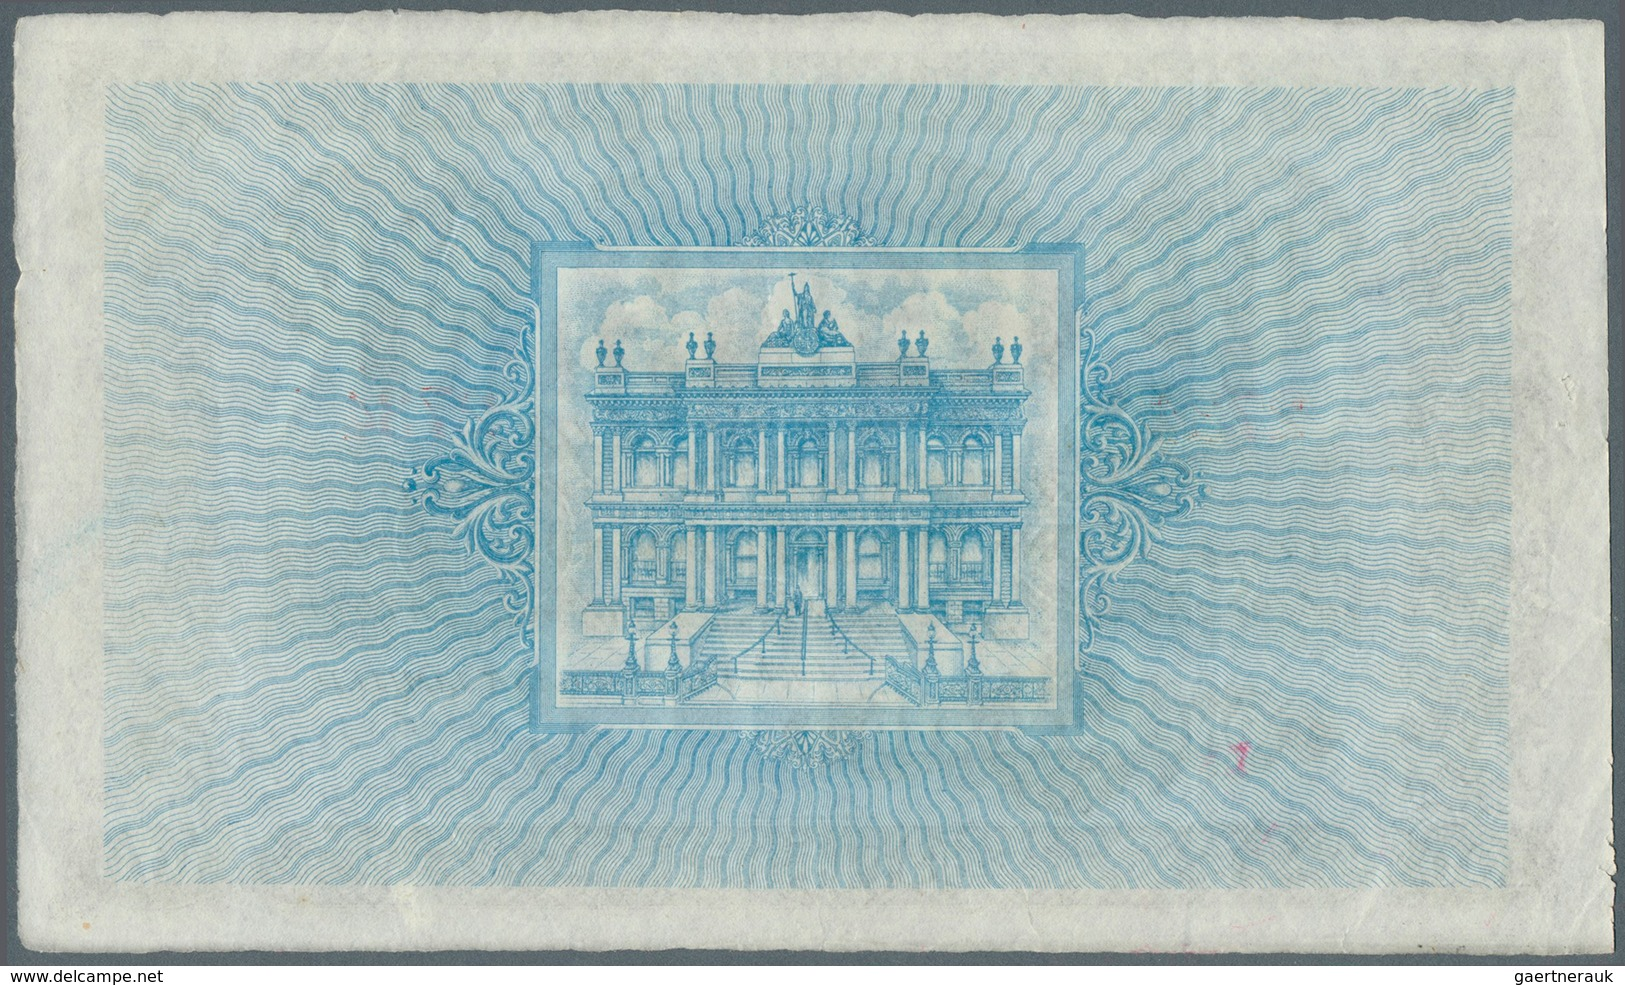 Northern Ireland / Nordirland: 100 Pounds 1943 P. 320, Ulster Bank Limited, Rare High Denomination N - [ 2] Ireland-Northern